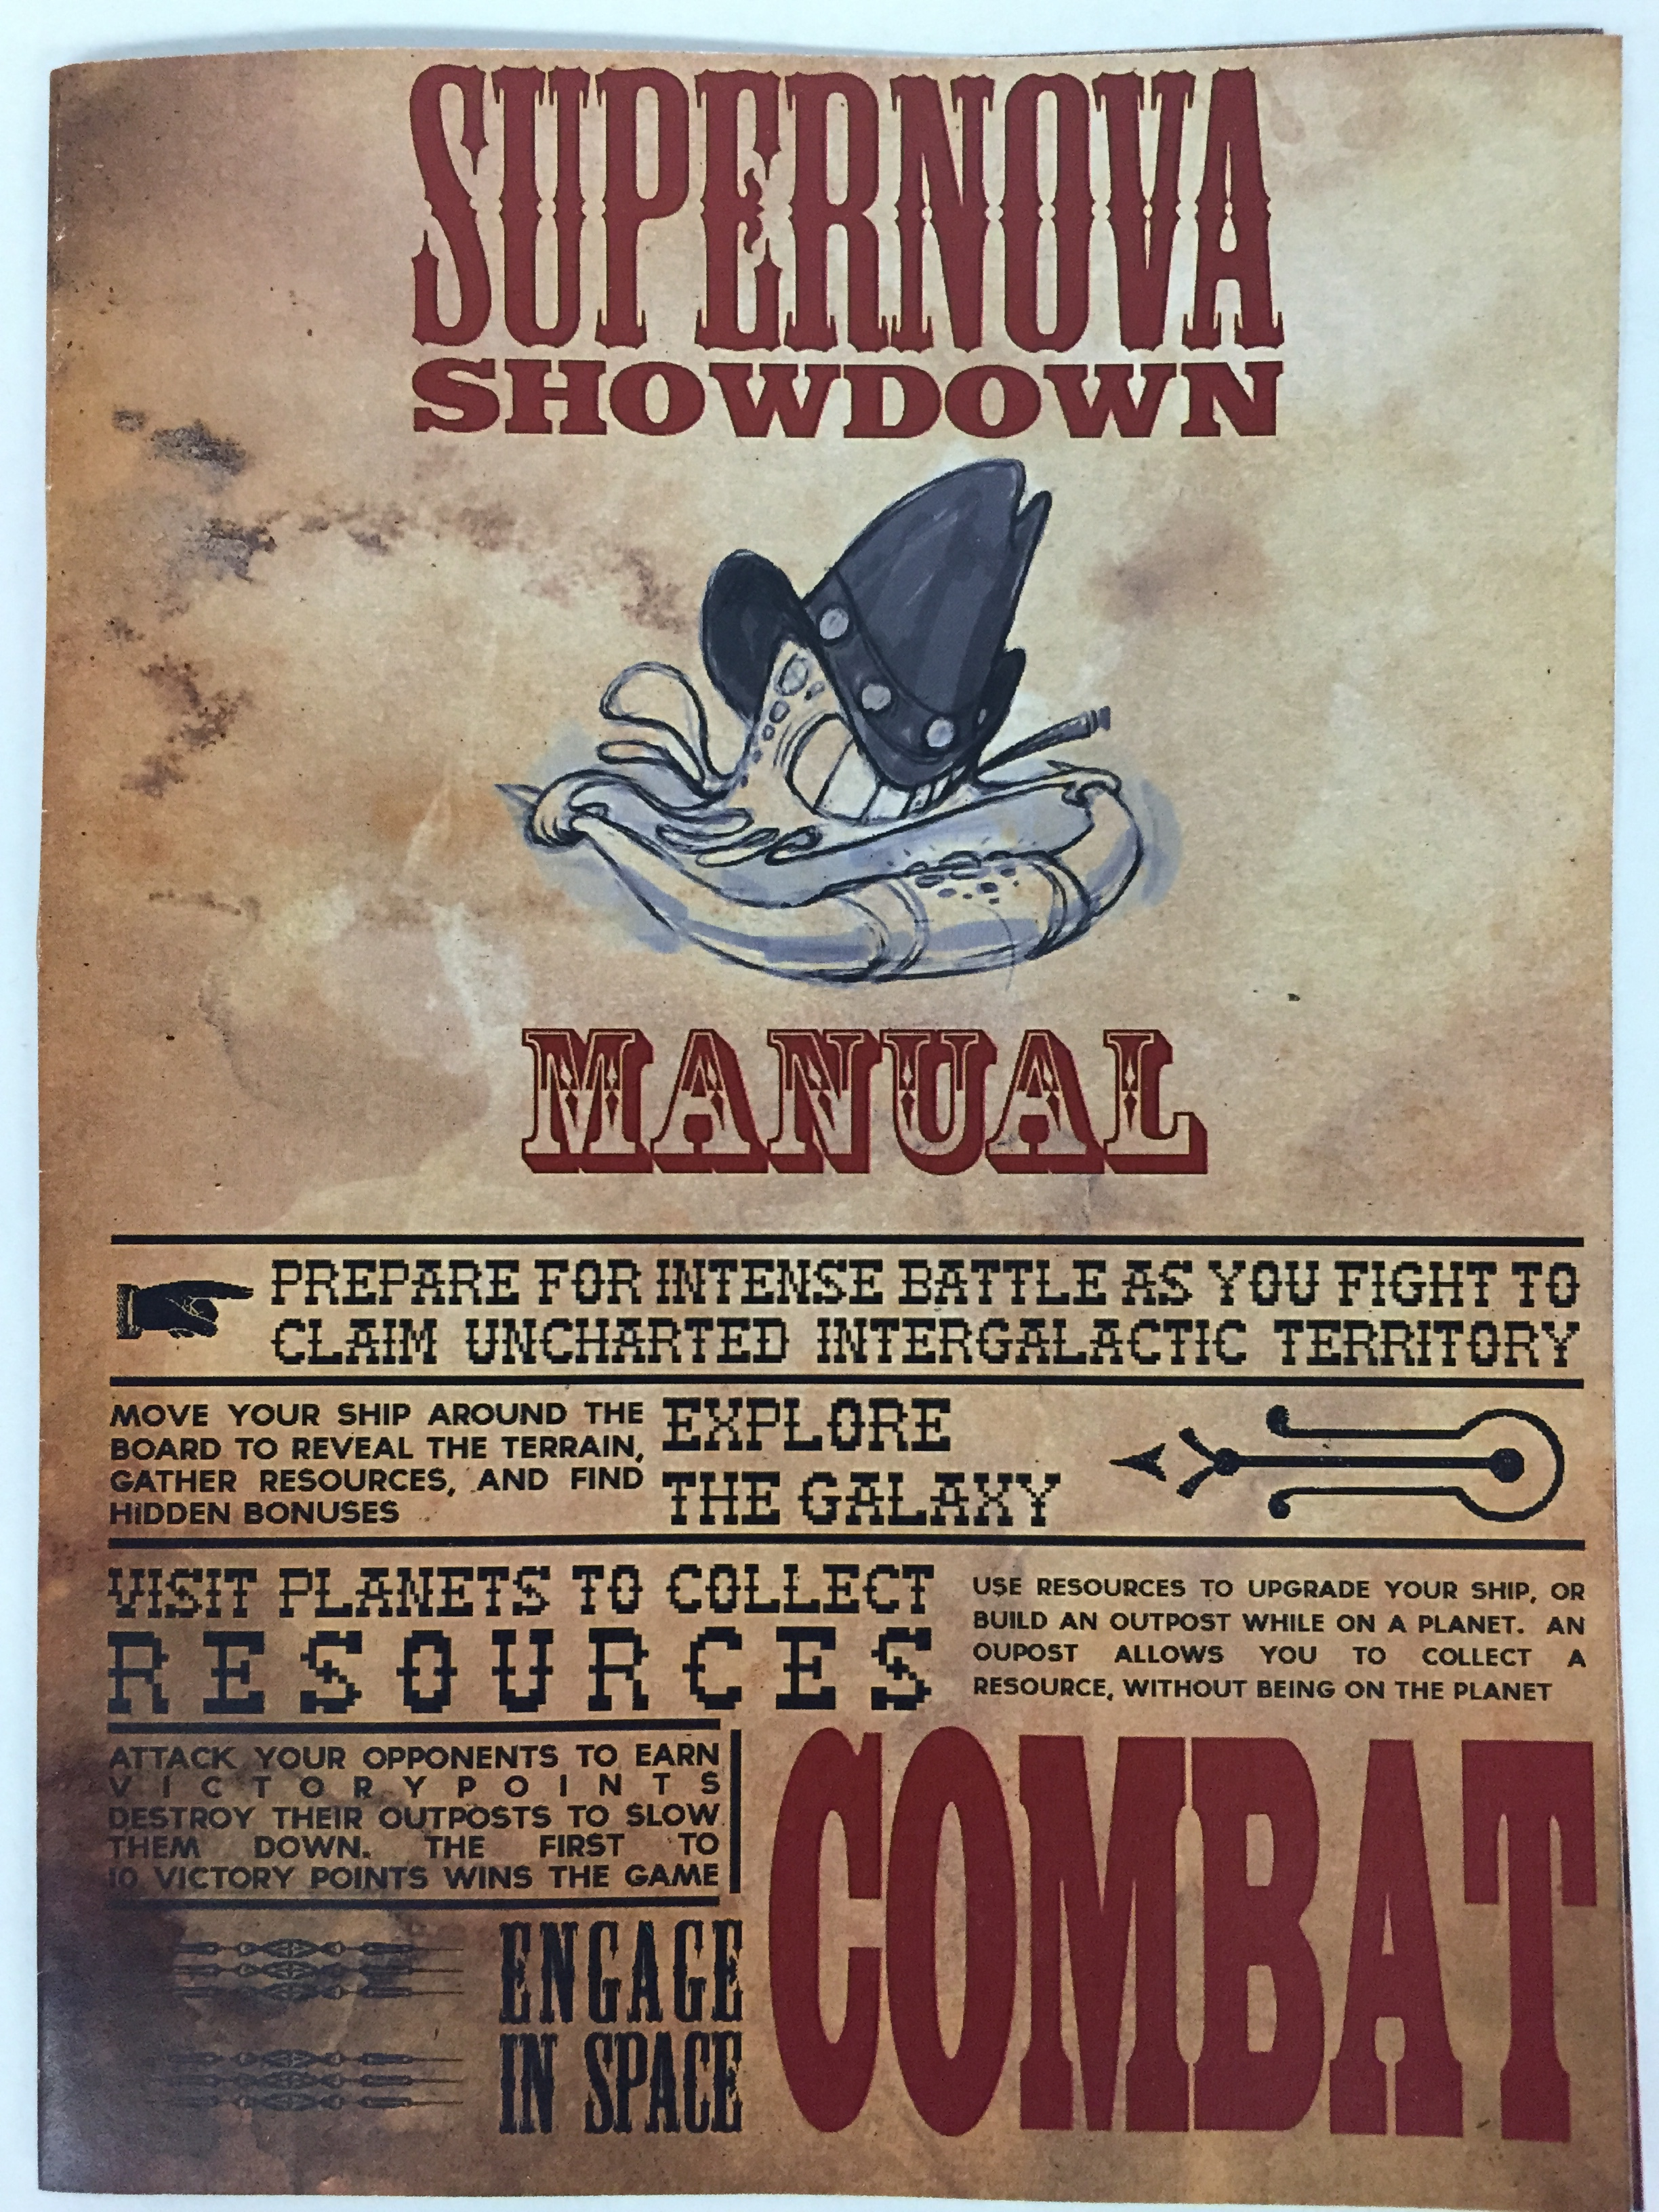 Joe-Kane-Industrial-Design-Minnesota-Supernova-Showdown-Manual.jpg